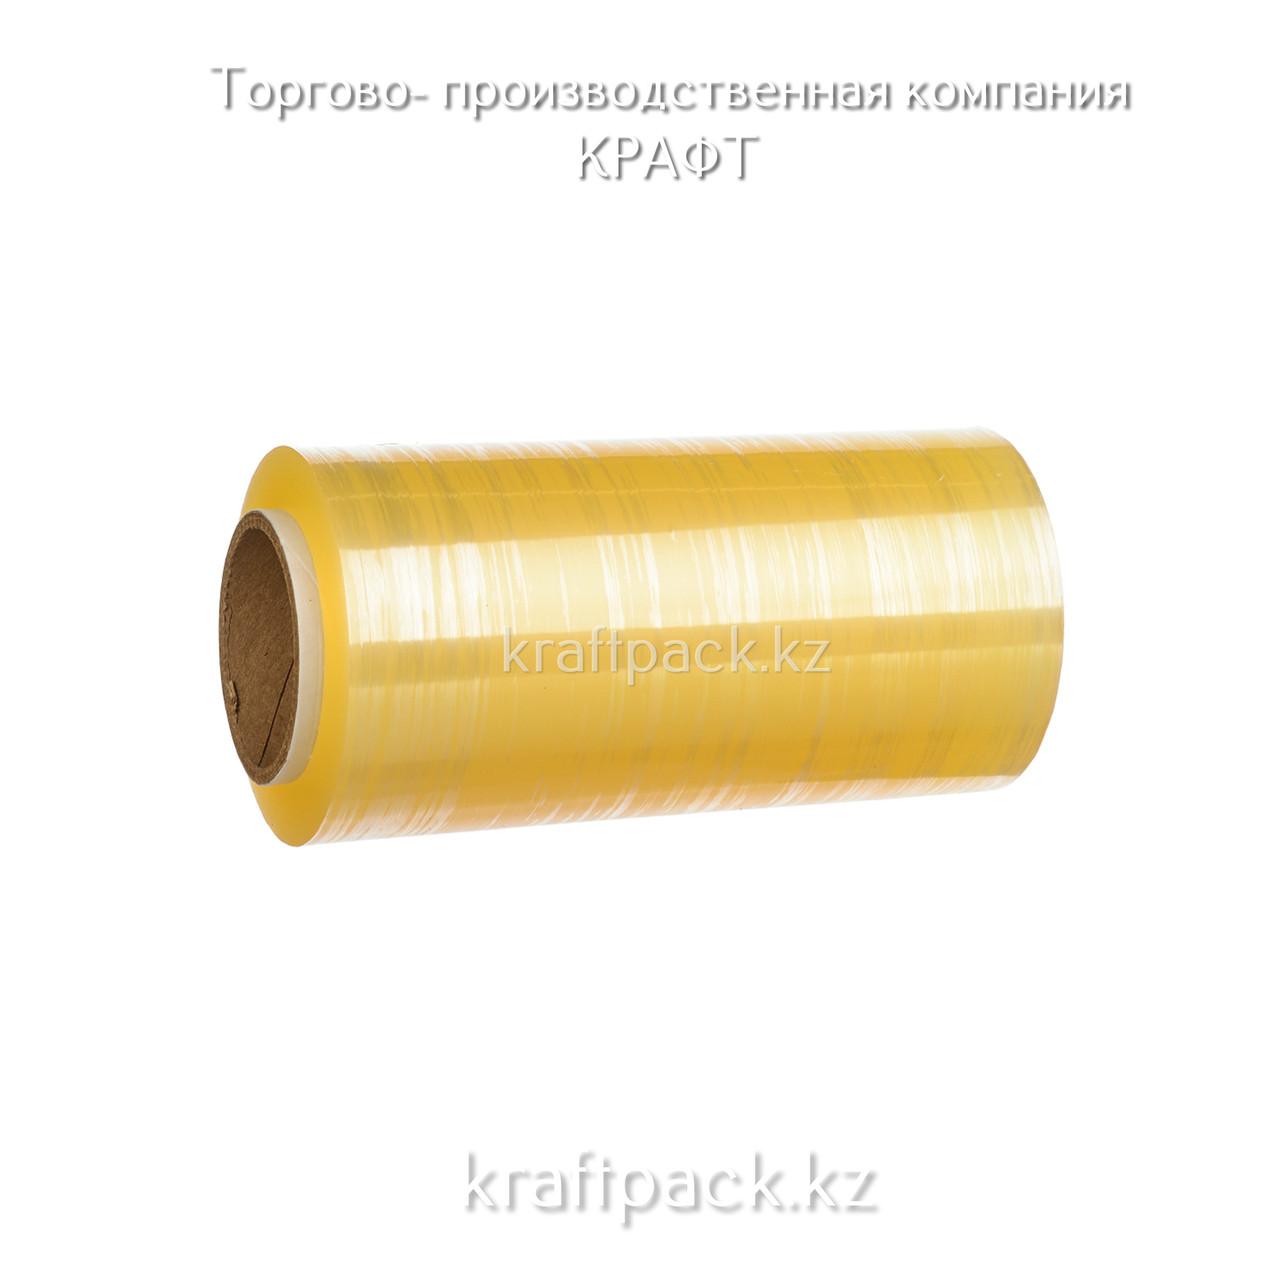 Пленка пищевая APF 300мм - намотка 900 метров, 8мкр  (Вес: 3,1 кг.)